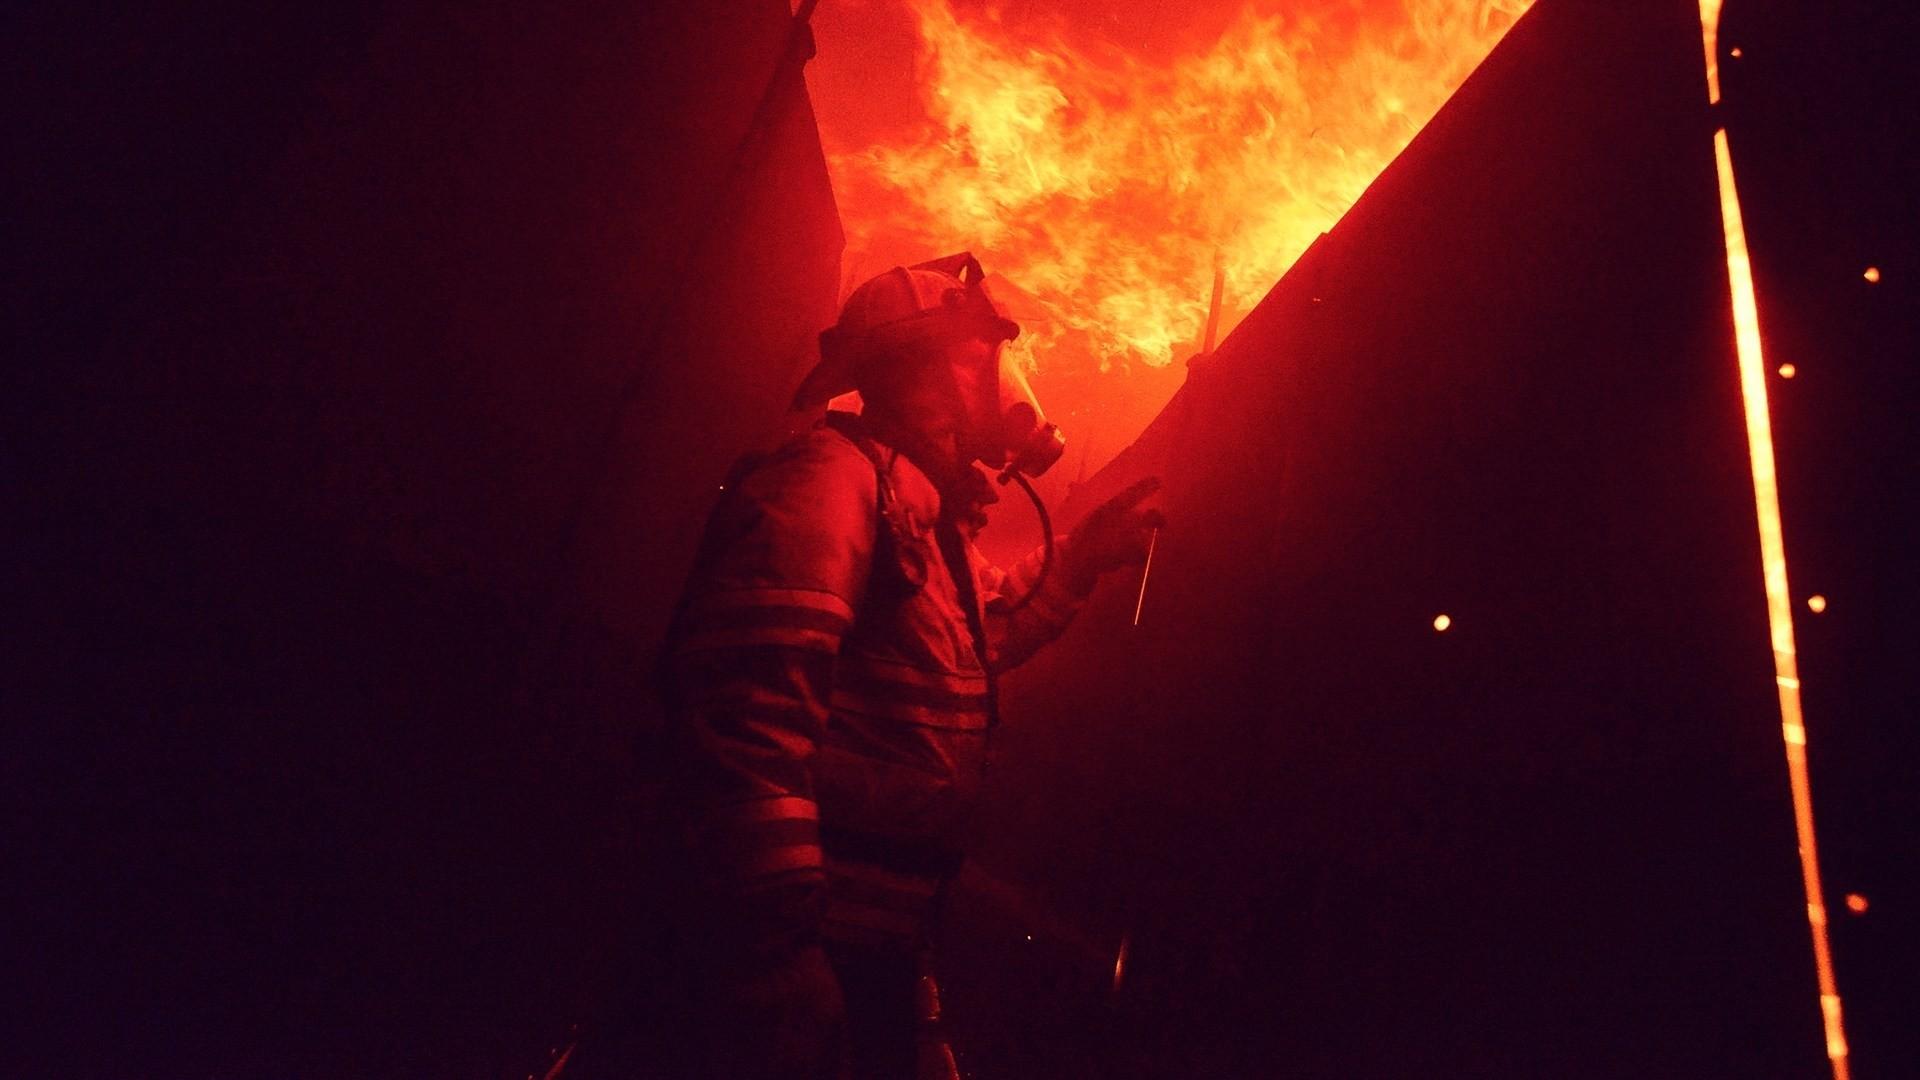 Firefighter Free Wallpaper